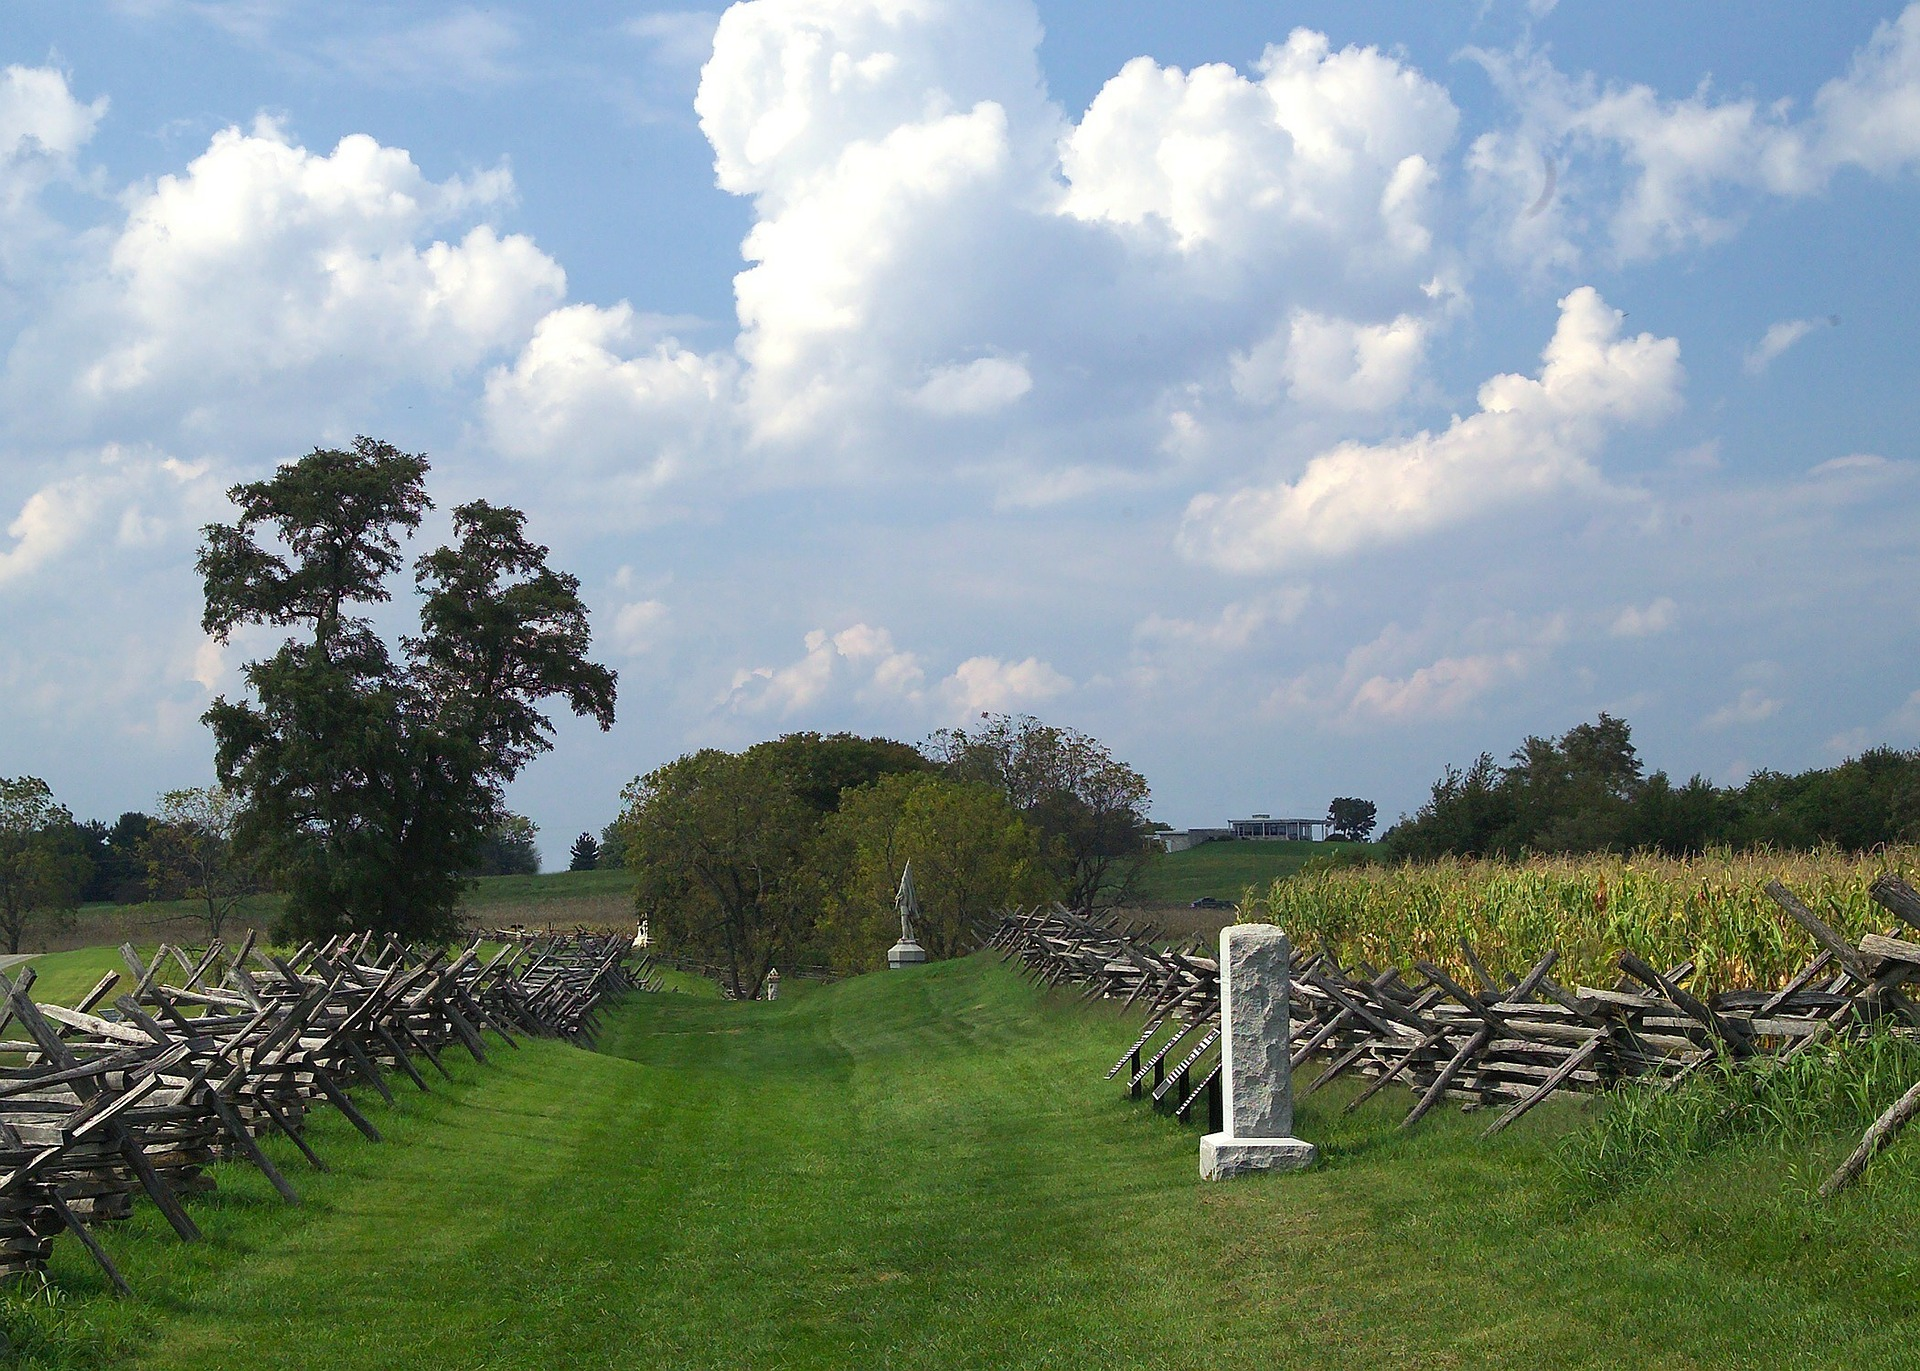 Antietam Civil War site